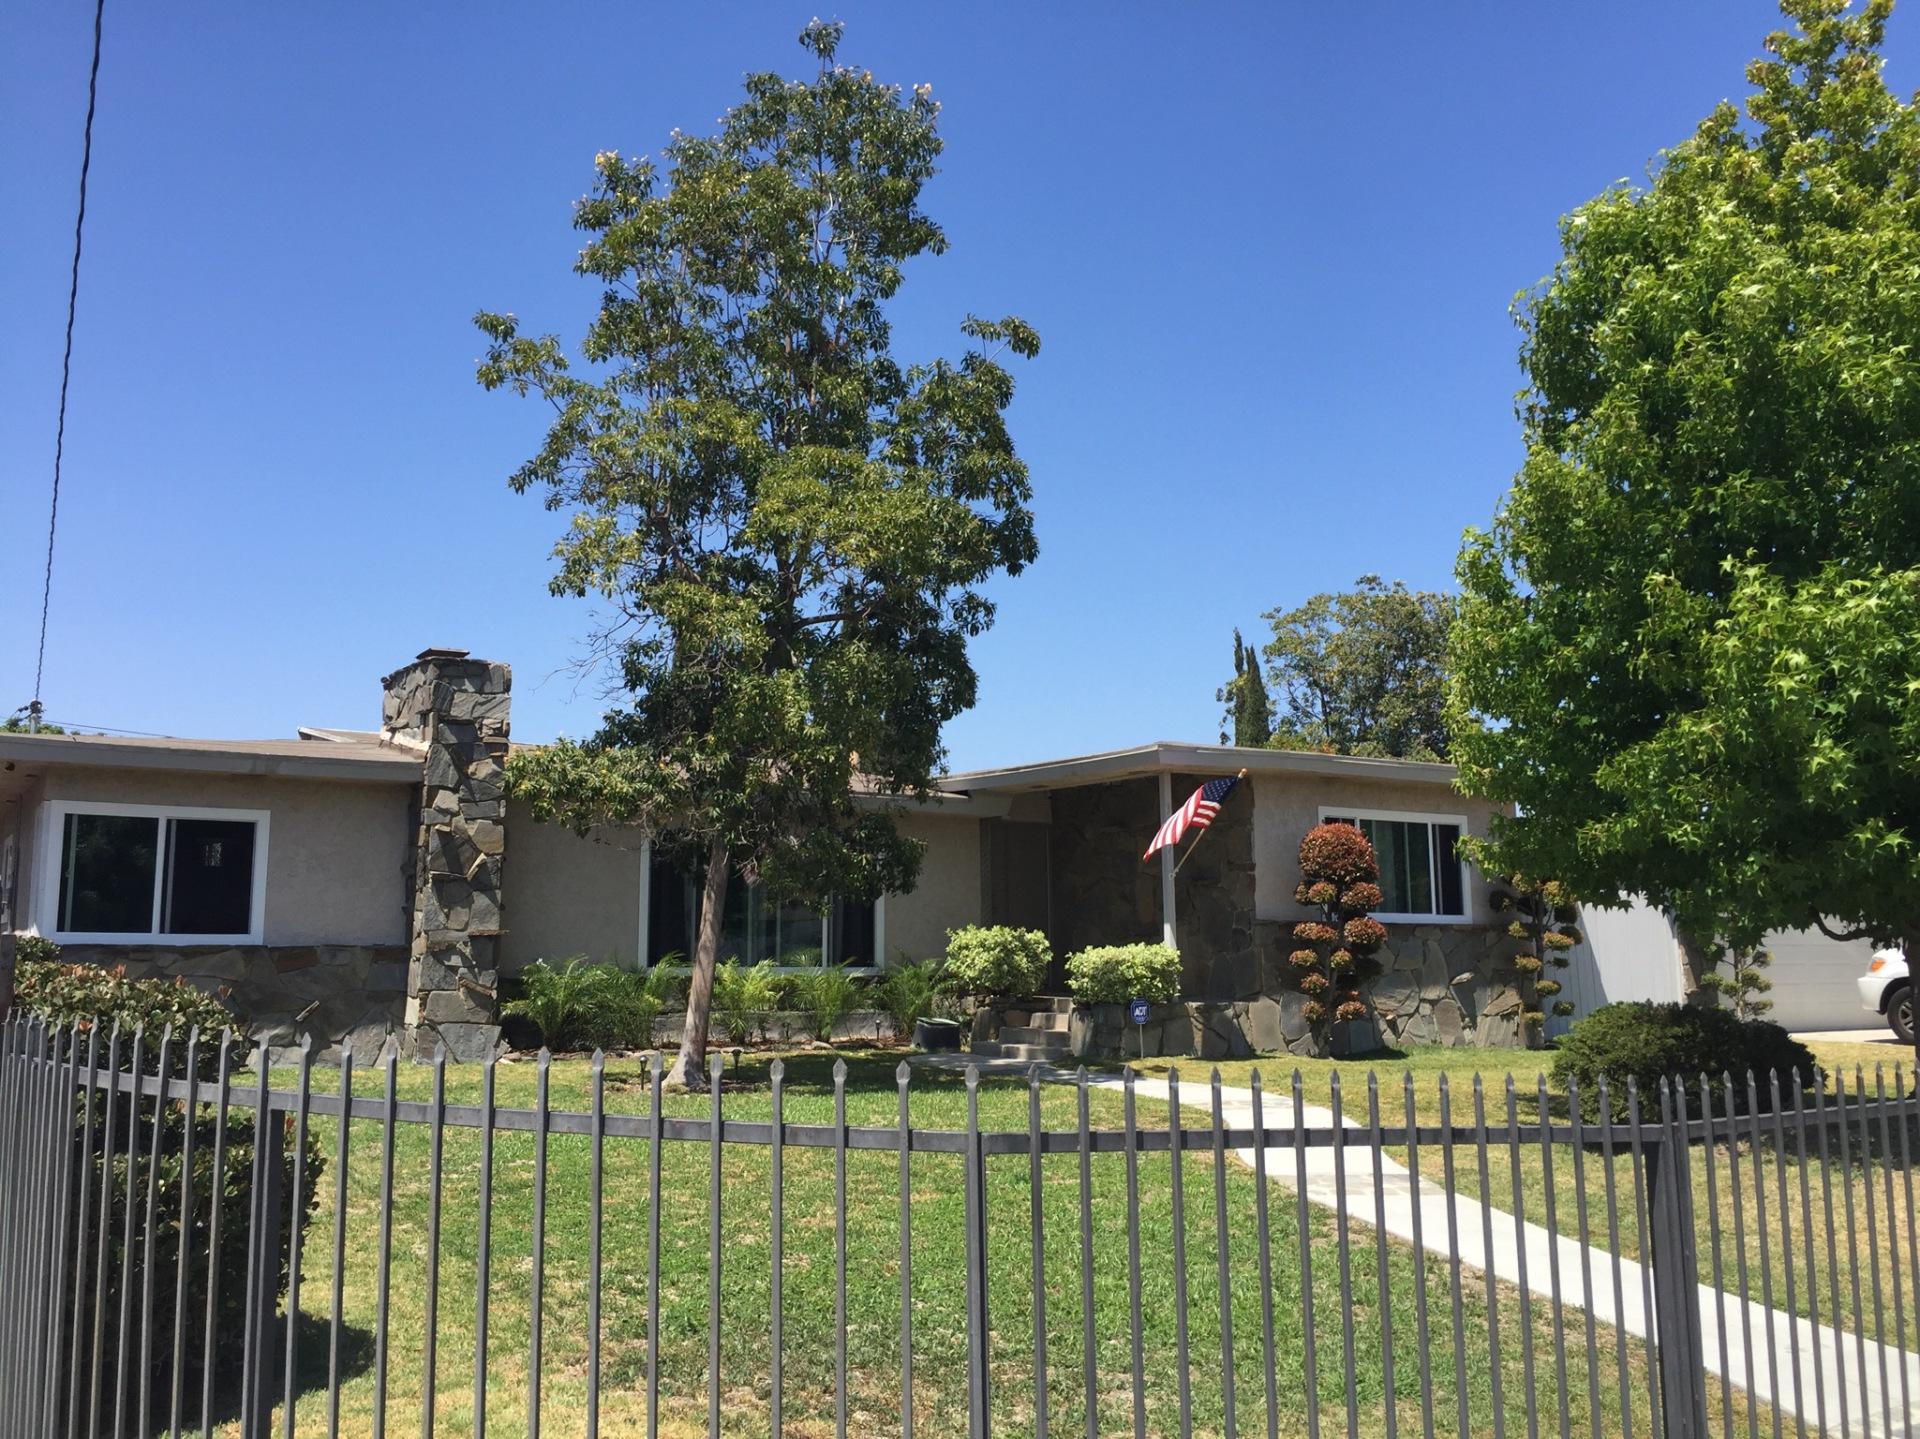 Brady Ave. Anaheim CA SFR Home Listed - Subject Photo